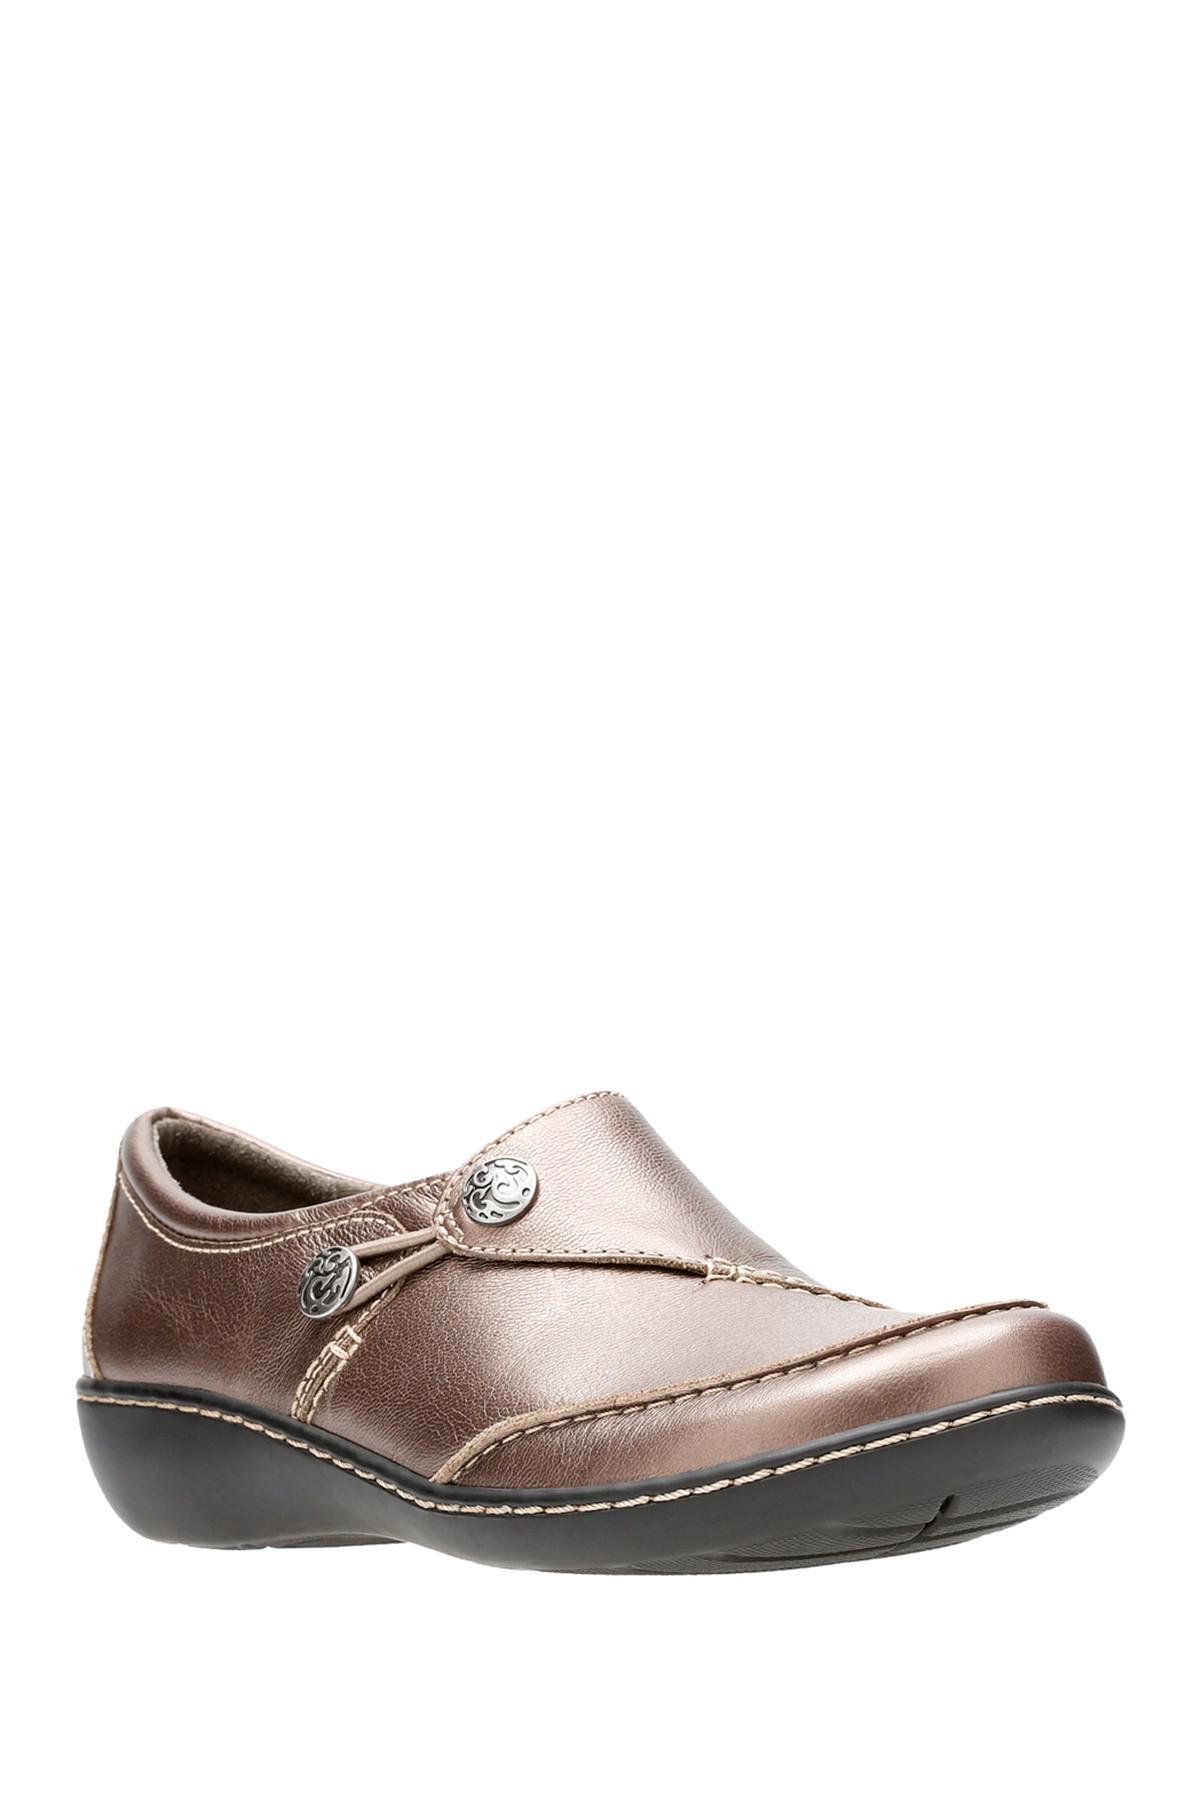 9b0e16a5fee Clarks. Women s Ashland Lane Q Leather Slip-on Loafer - Multiple Widths  Available